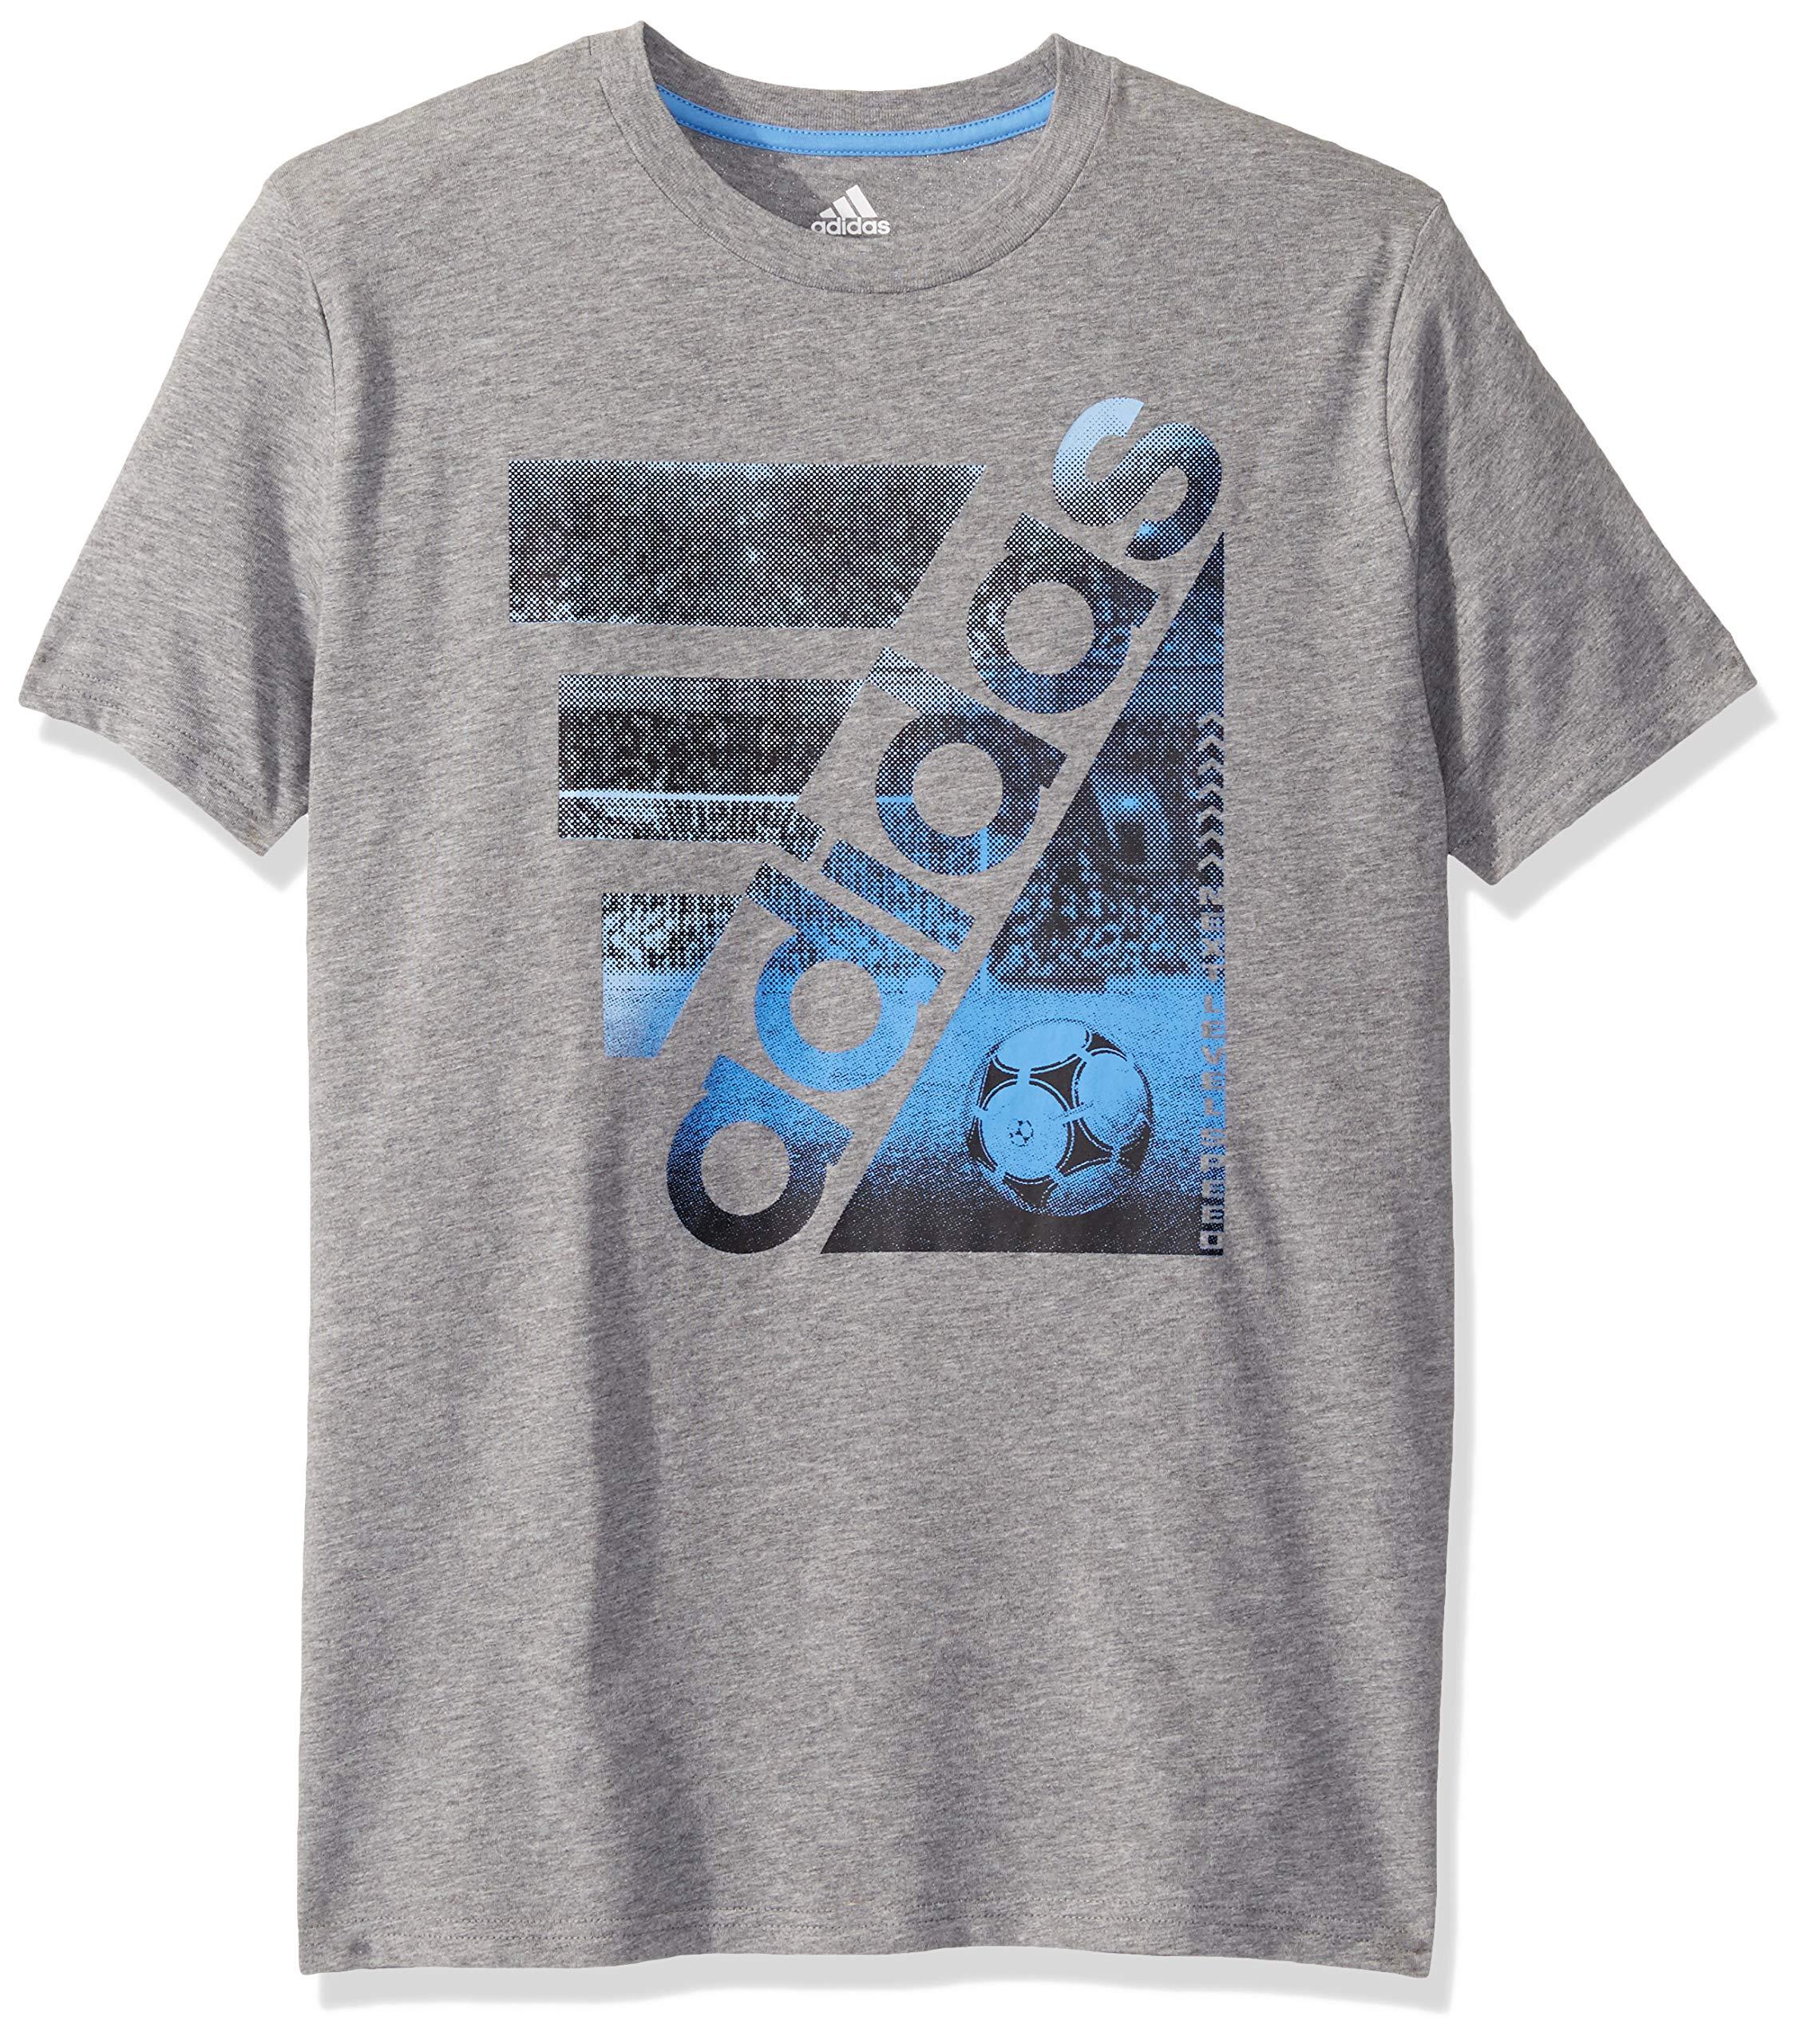 adidas Boys' Short Sleeve Cotton Jersey Graphic T-Shirt- Buy ...